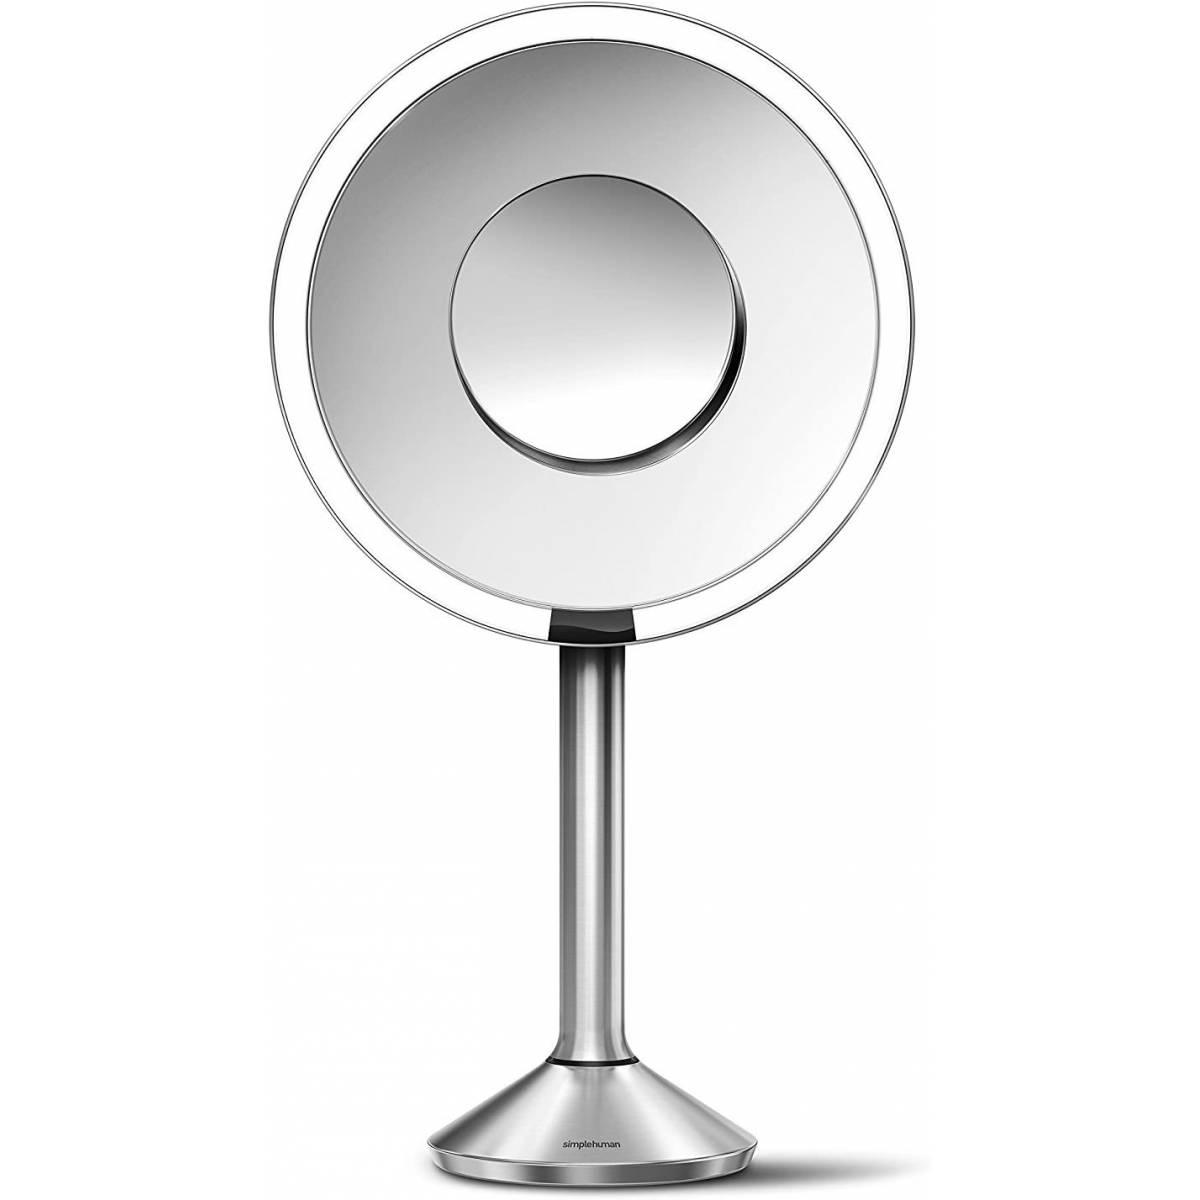 Зеркало сенсорное круглое Pro ST3007 Simplehuman